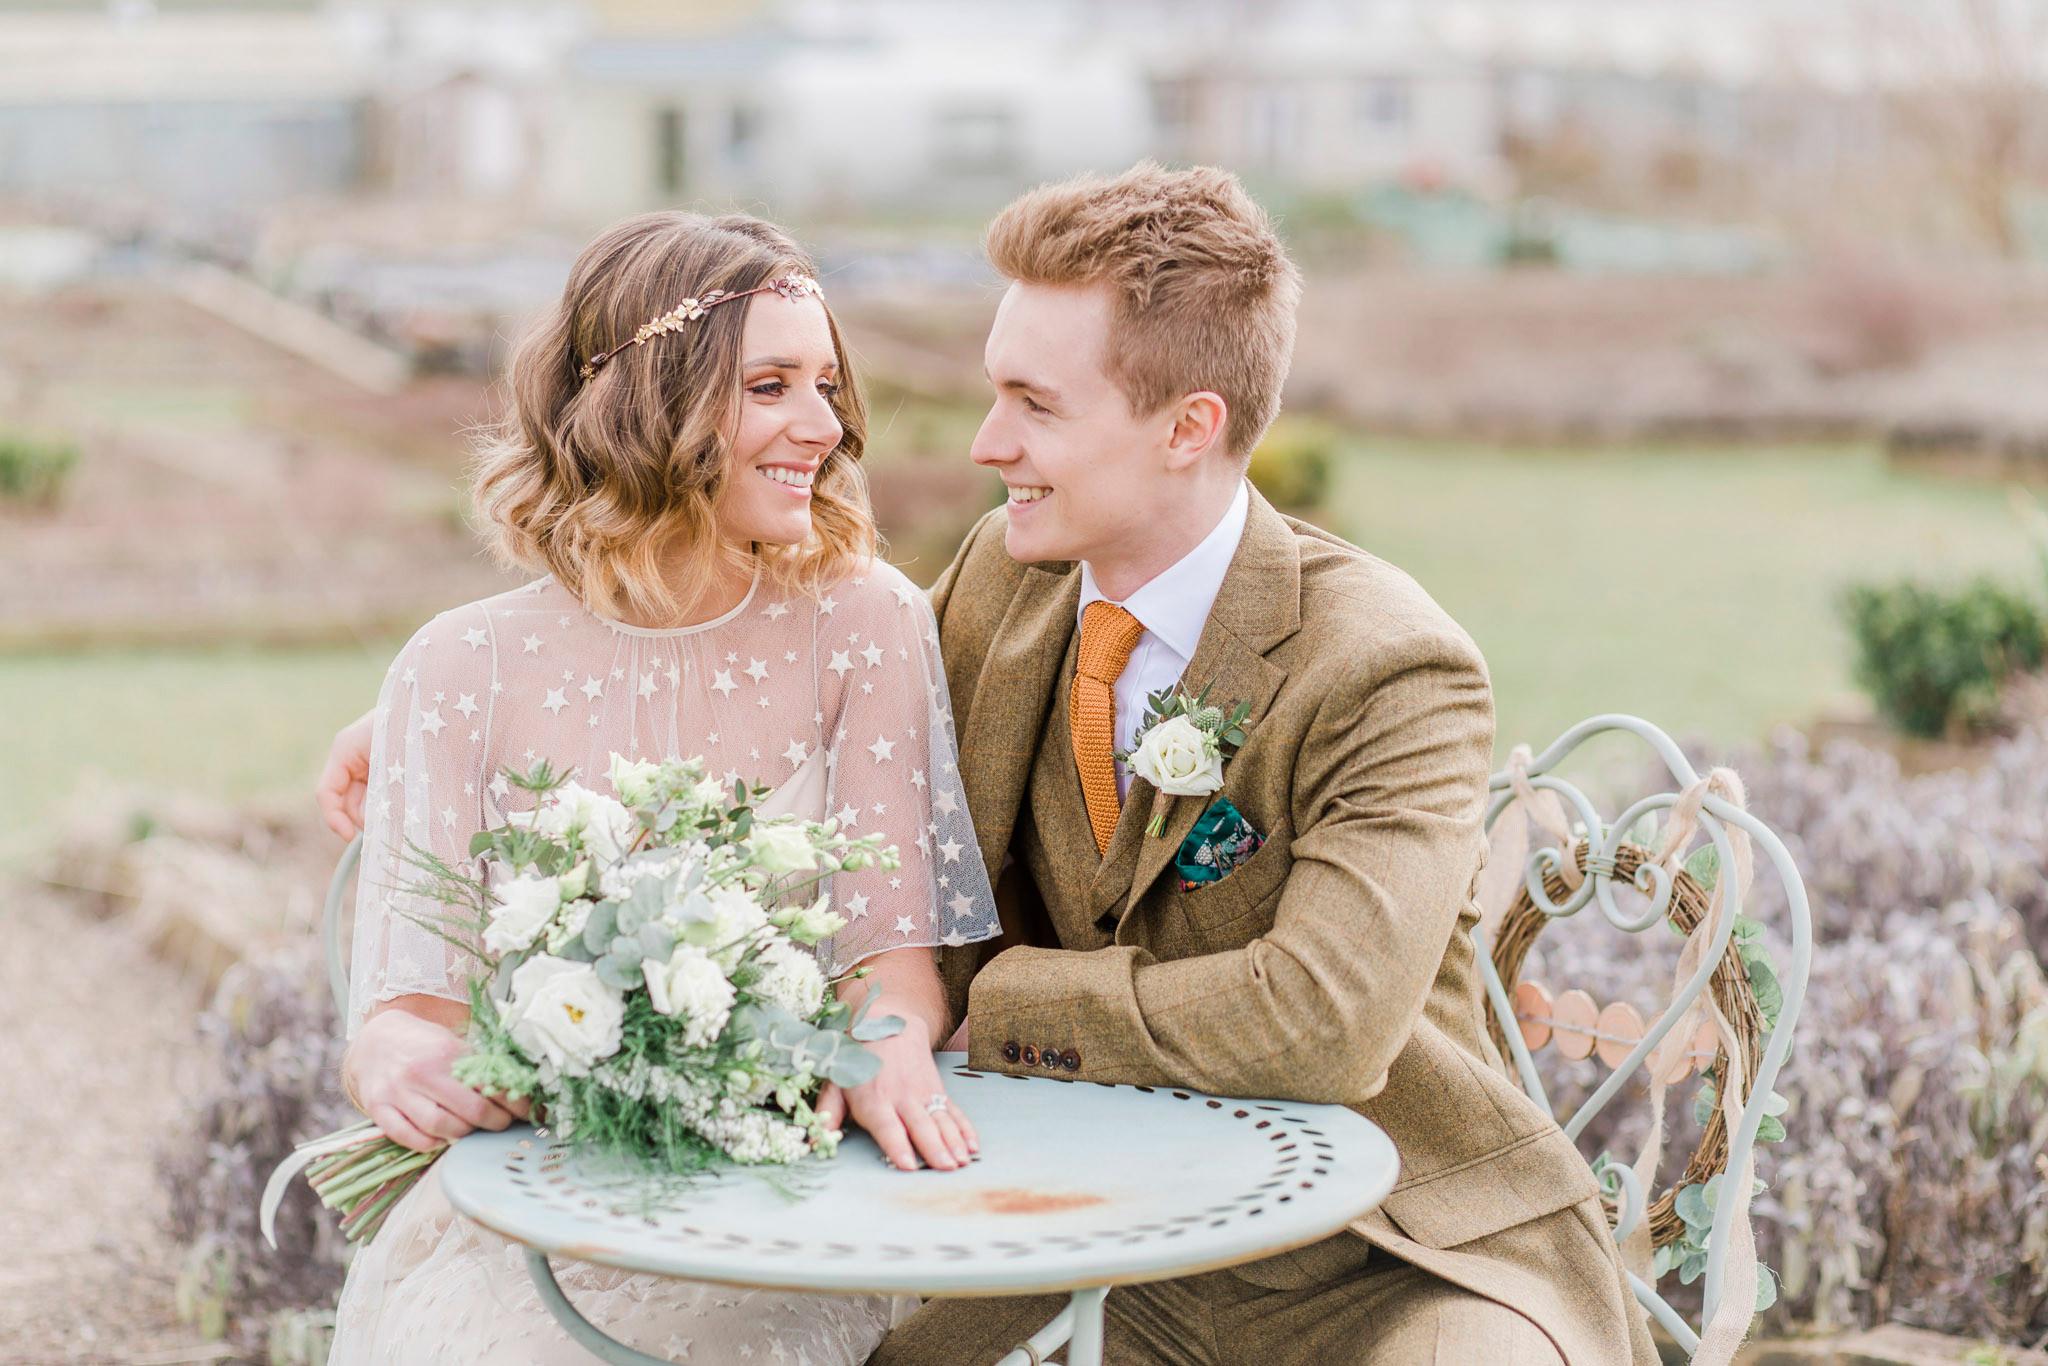 rustic-romantic-outdoor-wedding-photographer-edinburgh-08.jpg